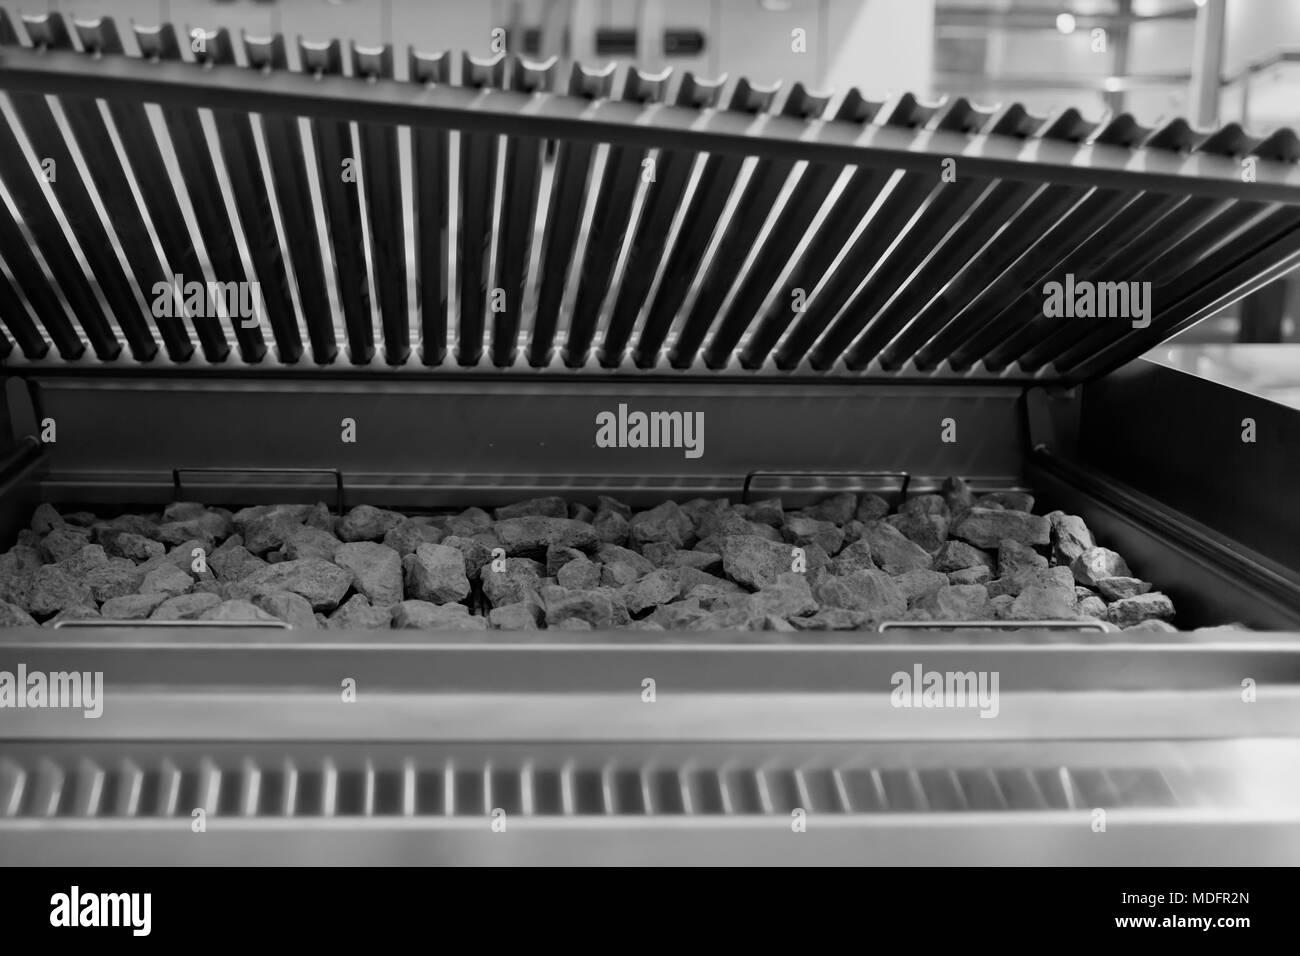 Kommerzielle Küche Grill Stockfoto, Bild: 180441597 - Alamy